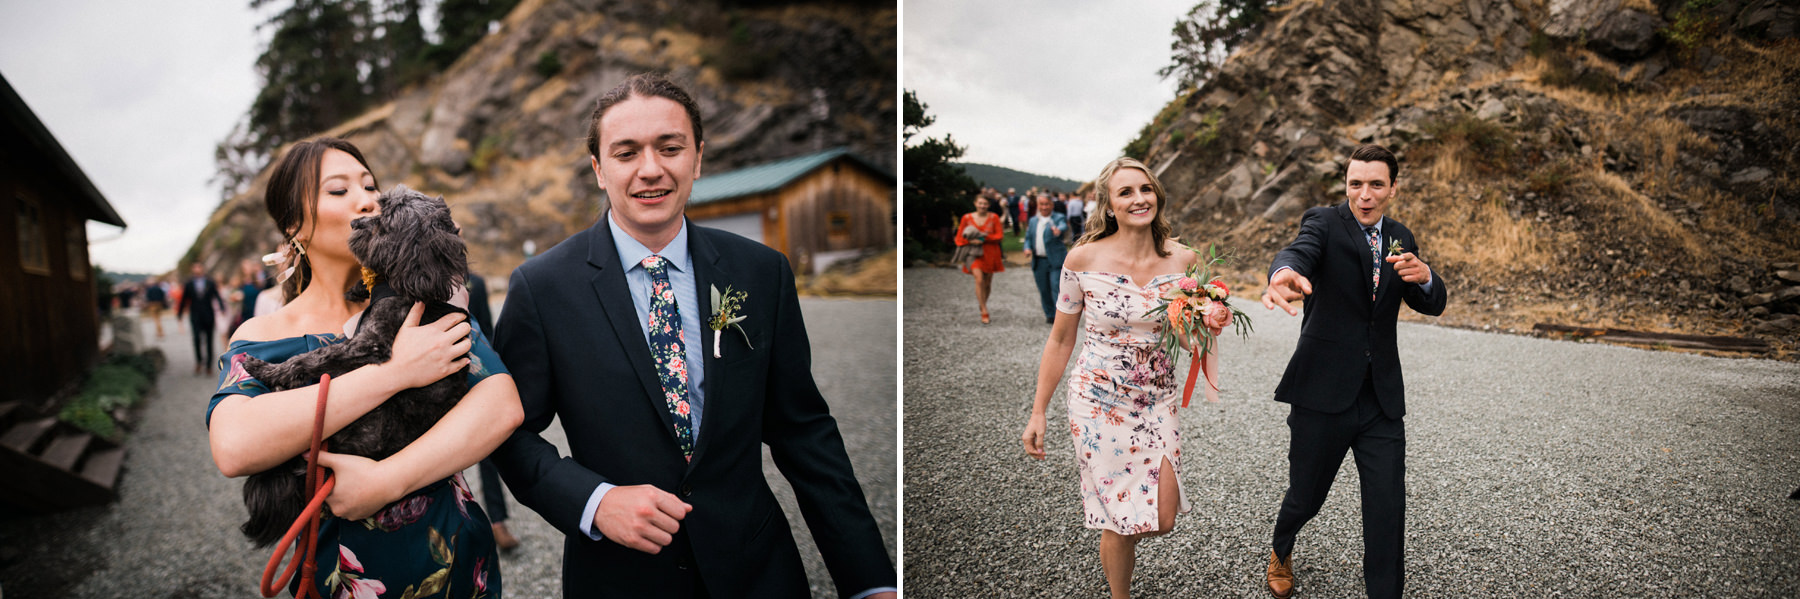 335-colorful-outdoor-lopez-island-wedding.jpg